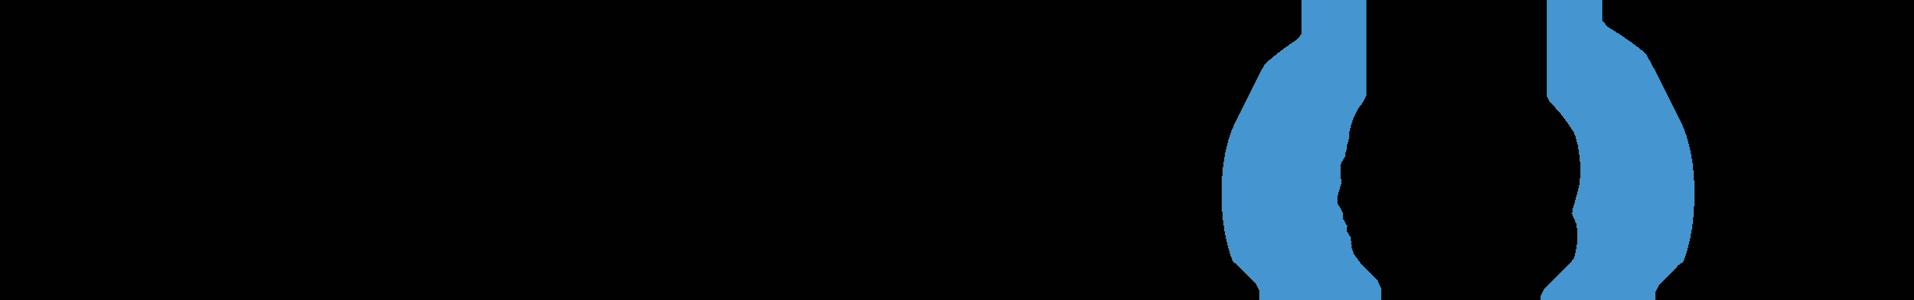 IH_Main_Logo.png